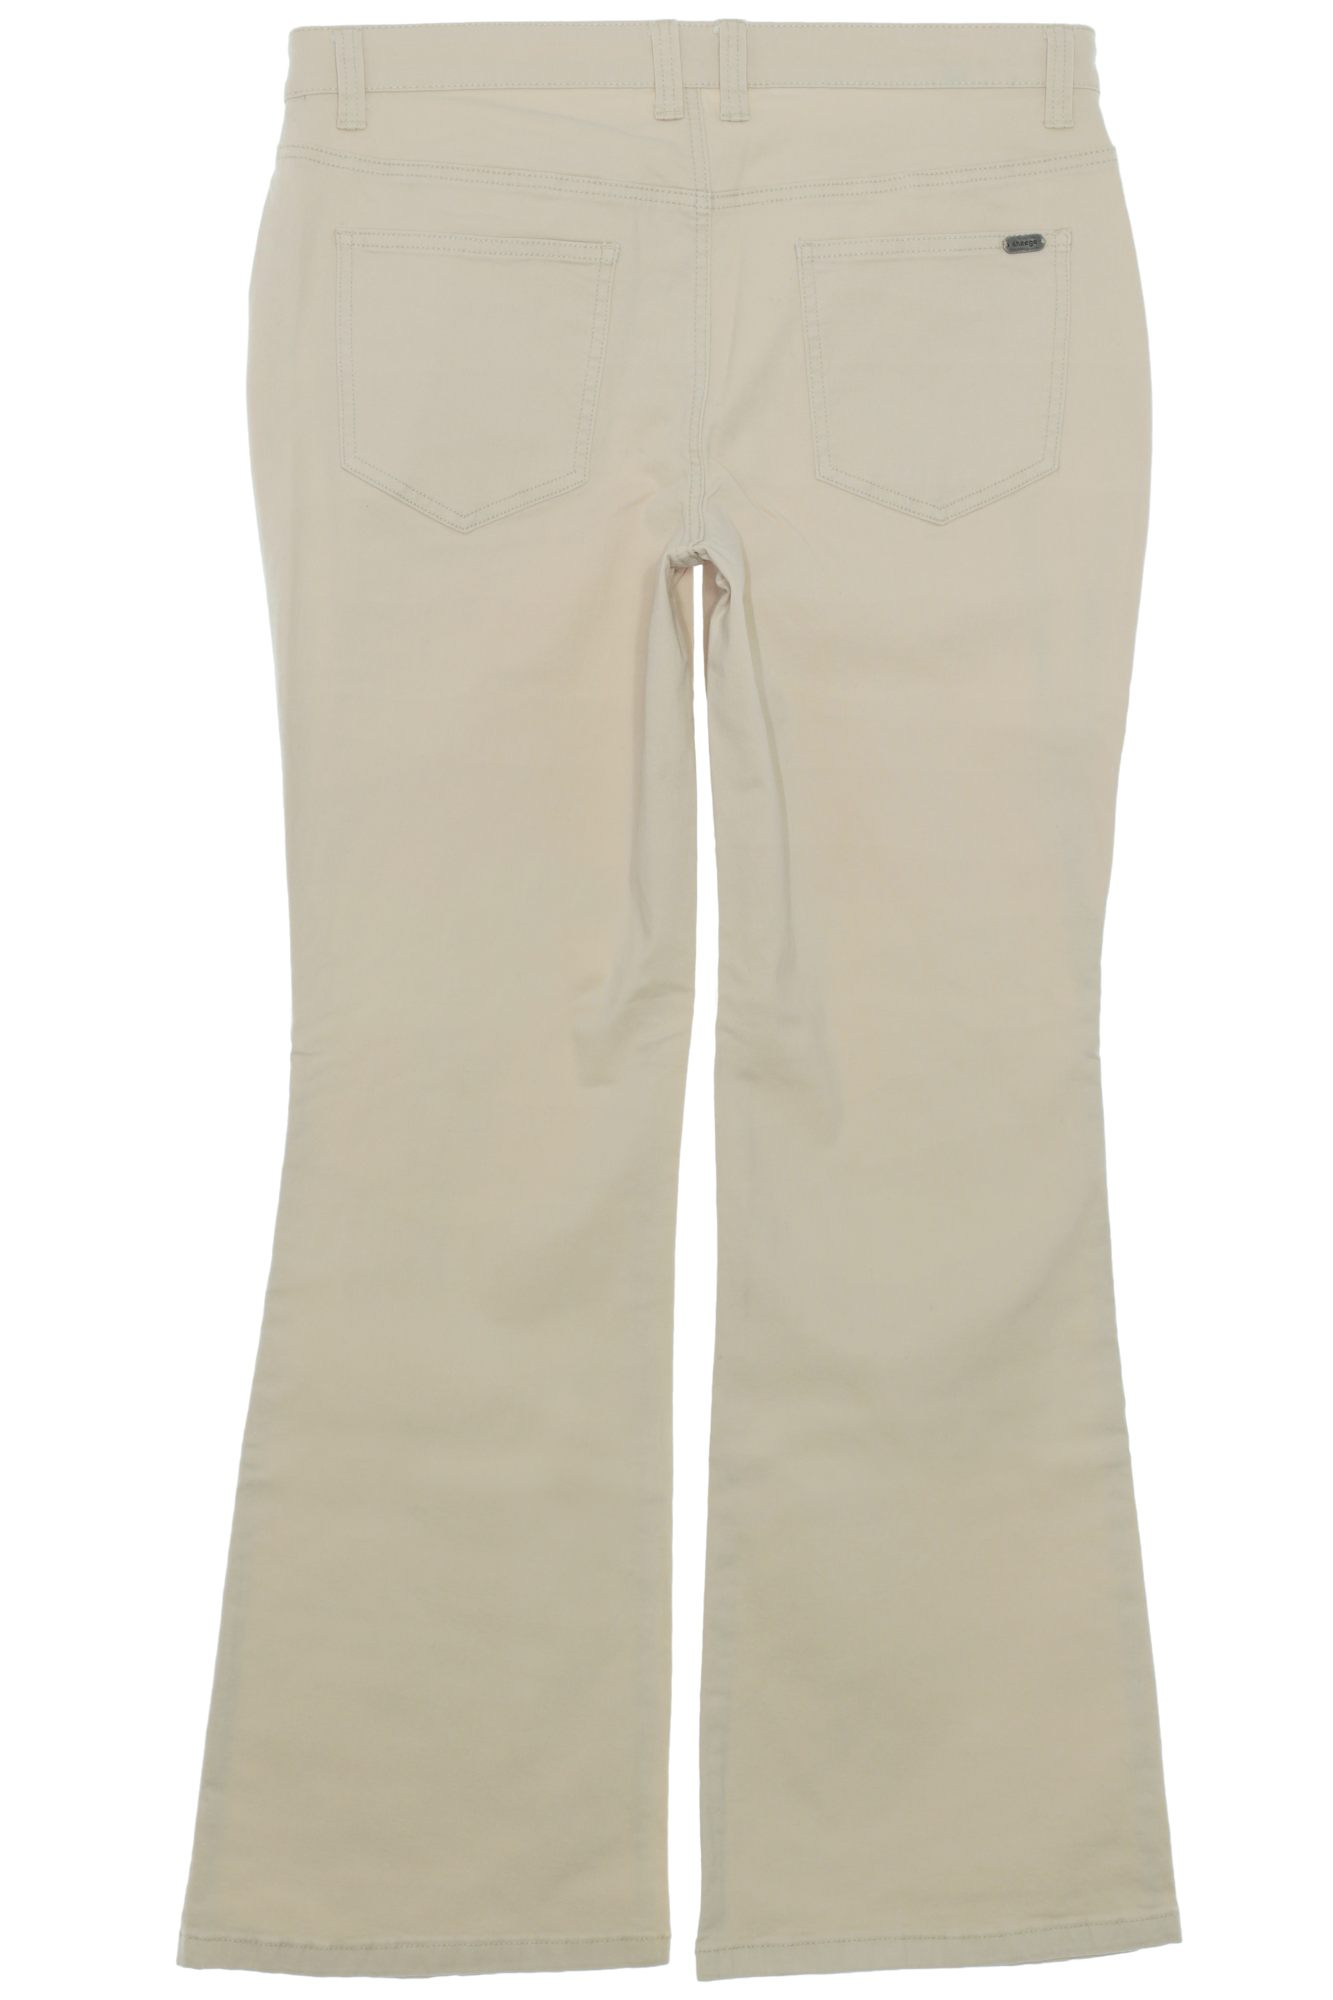 sheego Bootcut Twill Jeans Stretchjeans Damen Hose Blau Beige Plusgröße Oversize